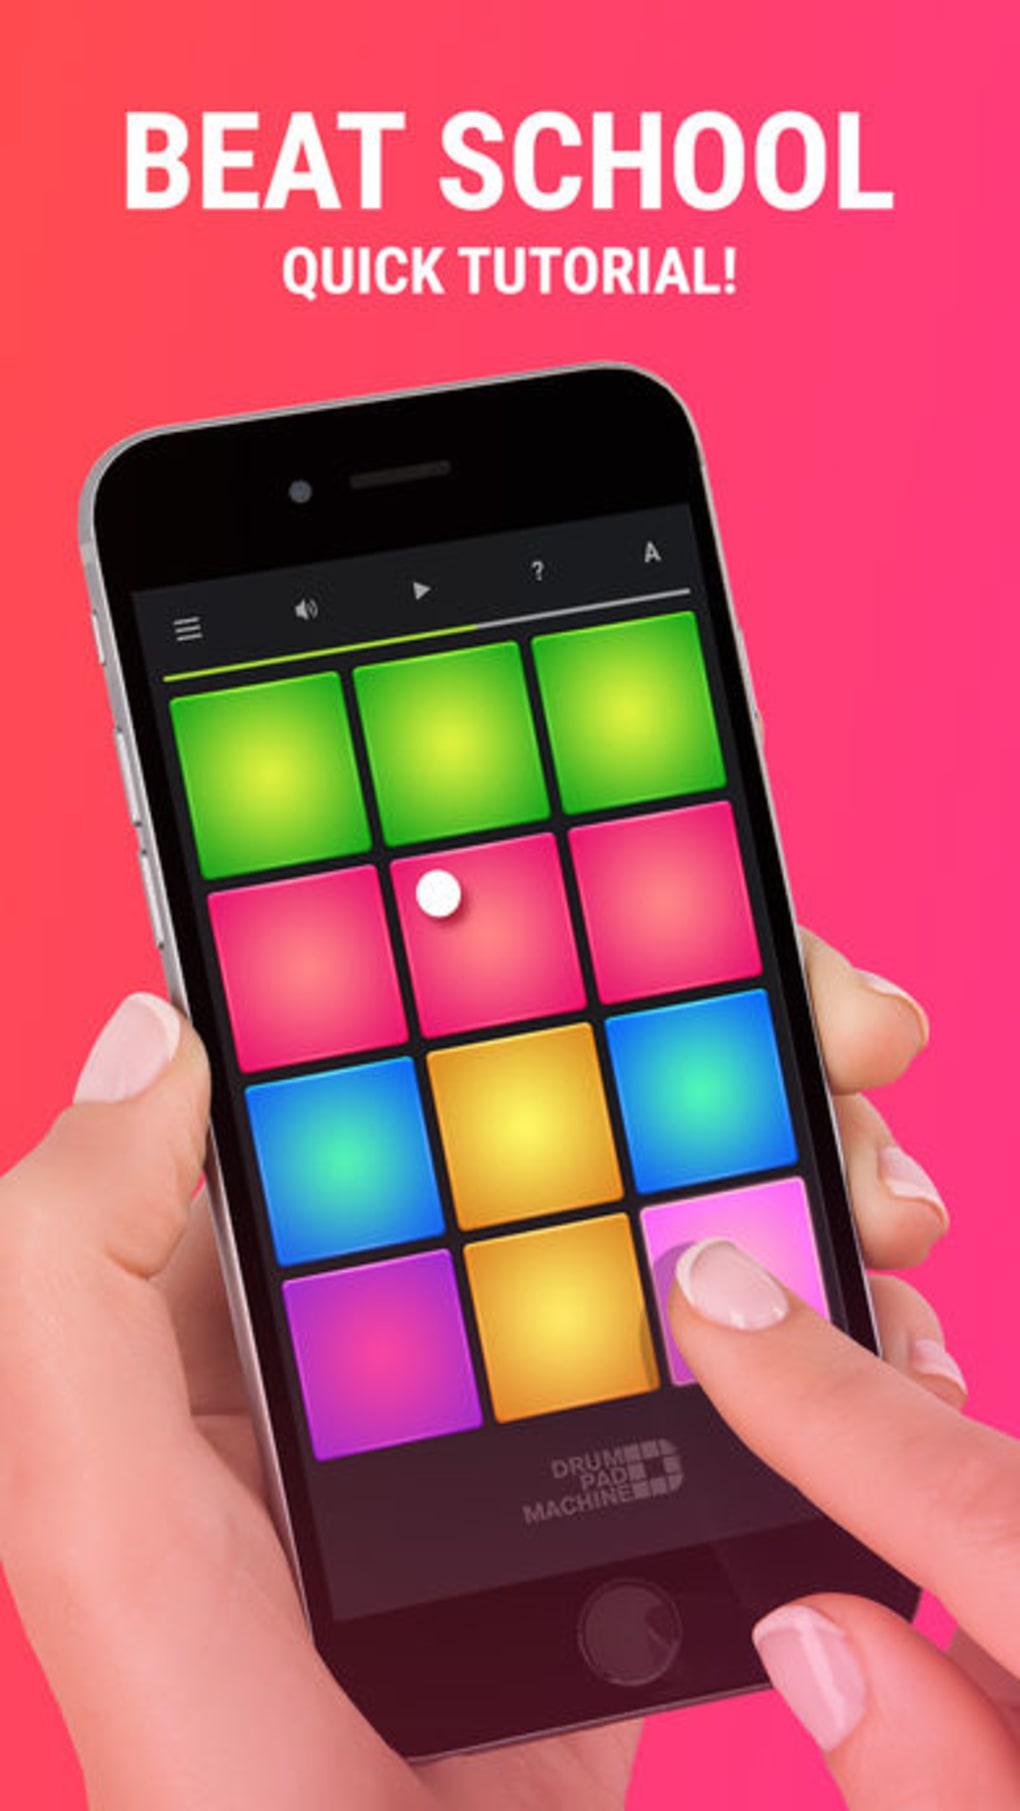 Drum Pad Machine - Beat Maker for iPhone - Download